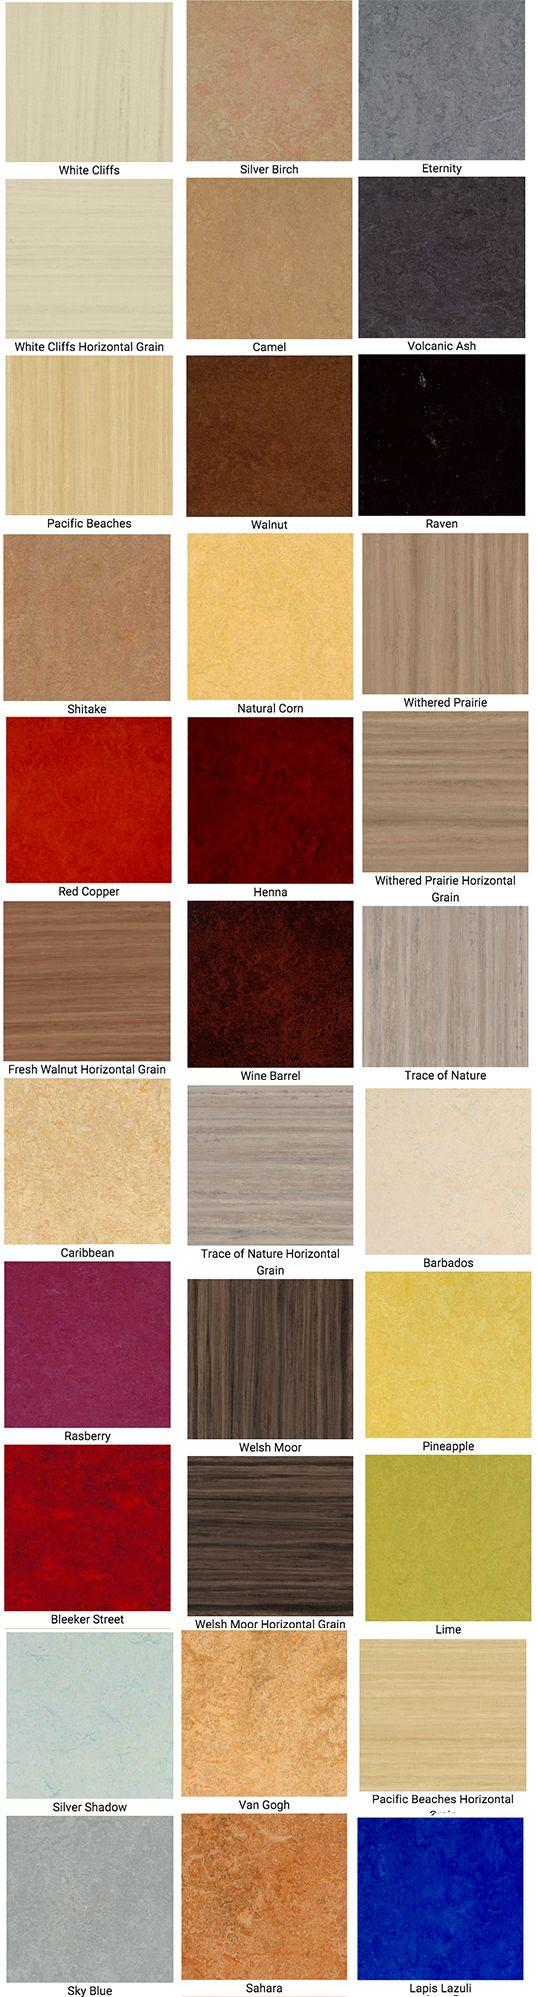 Marmoleum Click Square Marmoleum Click Flooring Kitchen Flooring